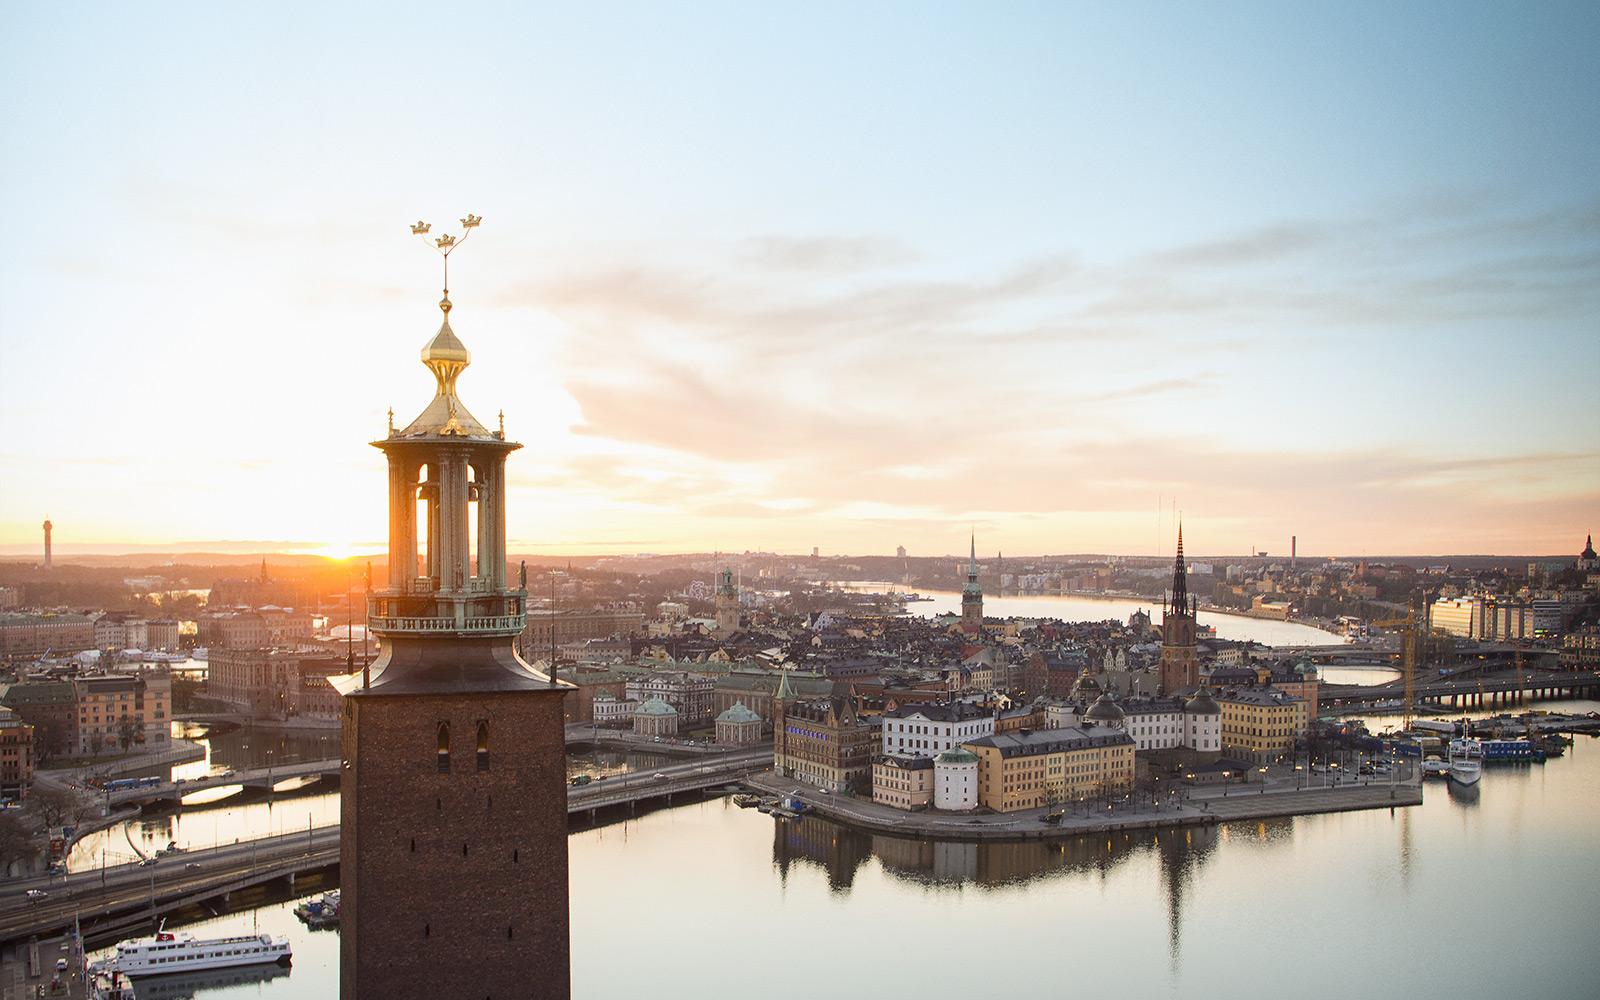 sas flyg göteborg stockholm